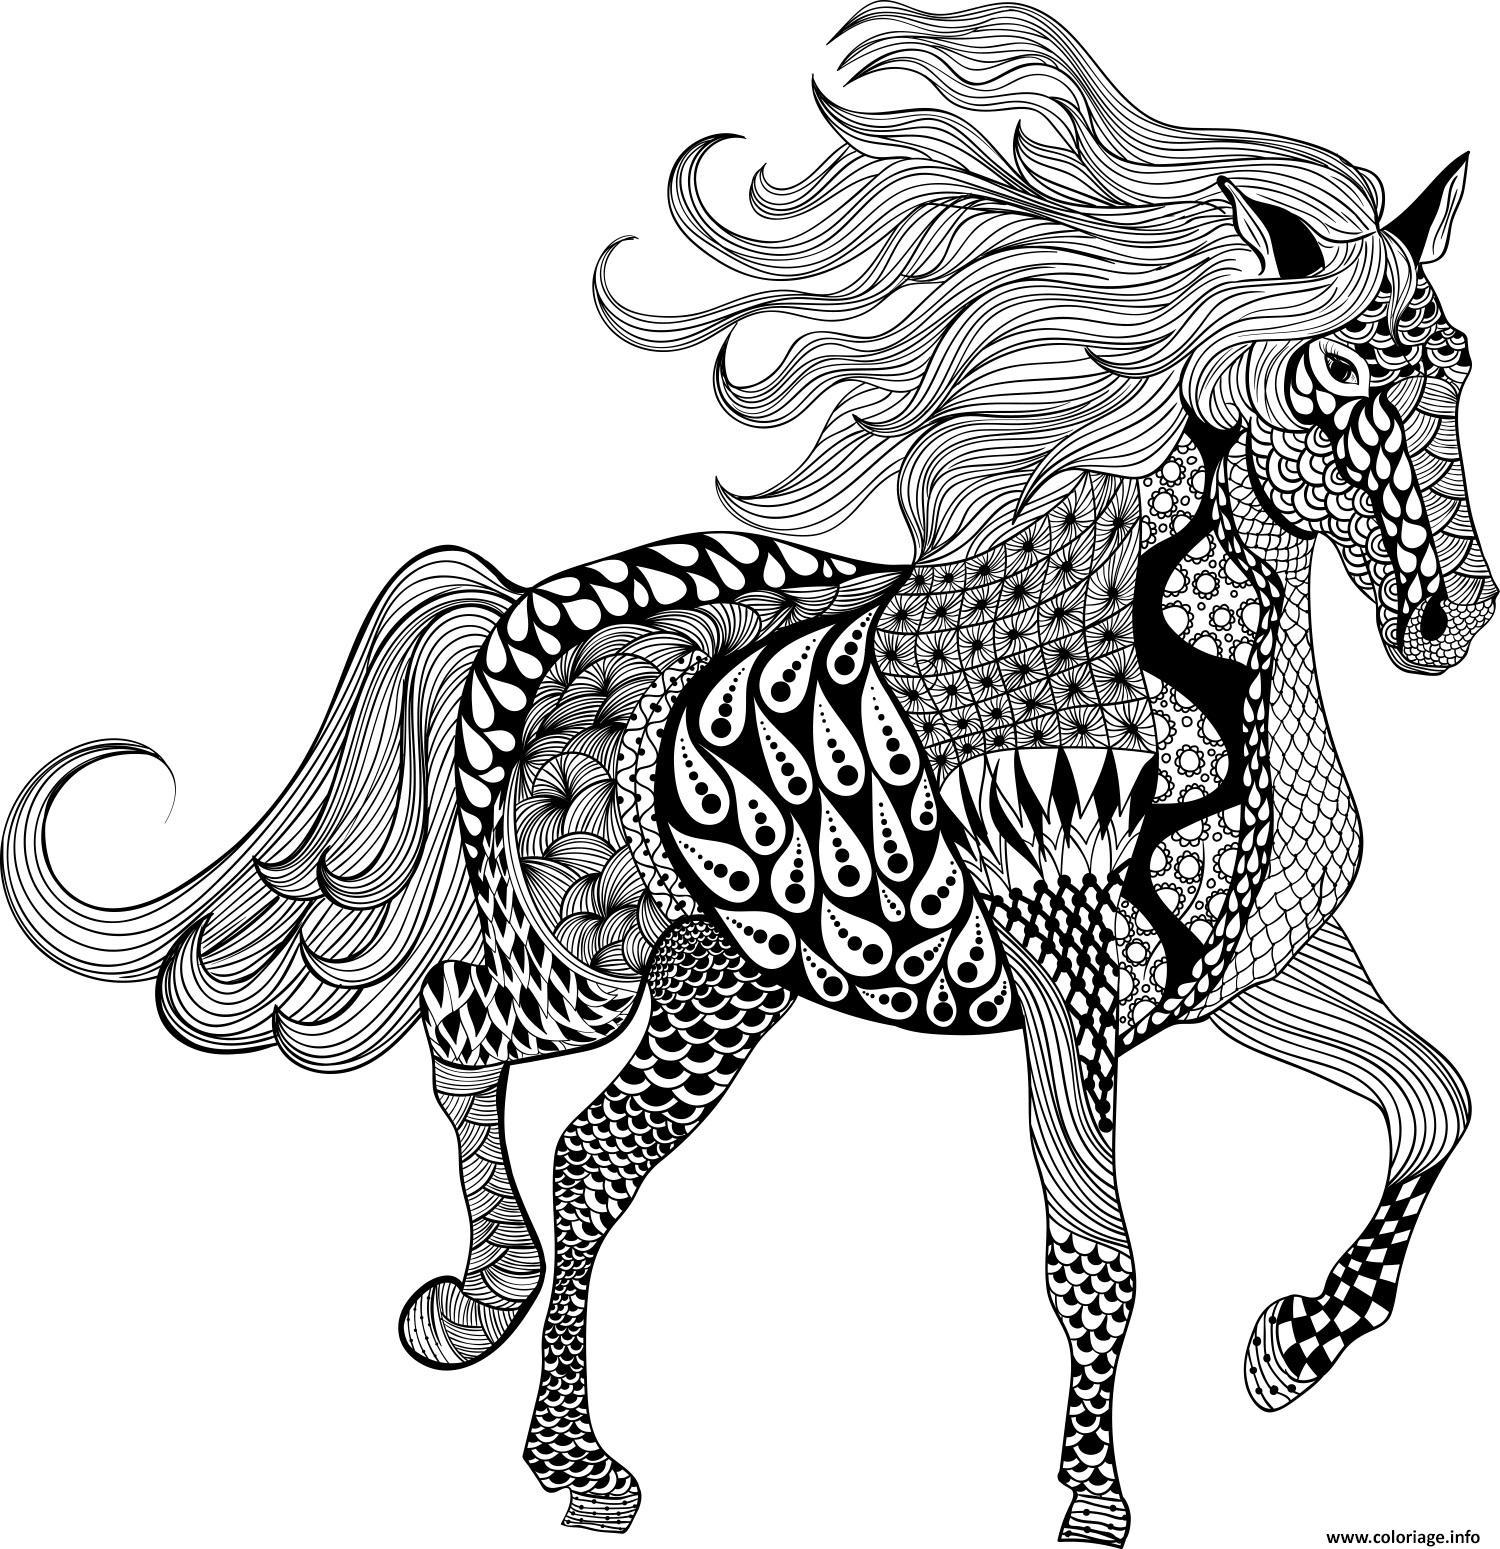 Coloriage adulte mandala horse - Mandala de chevaux ...